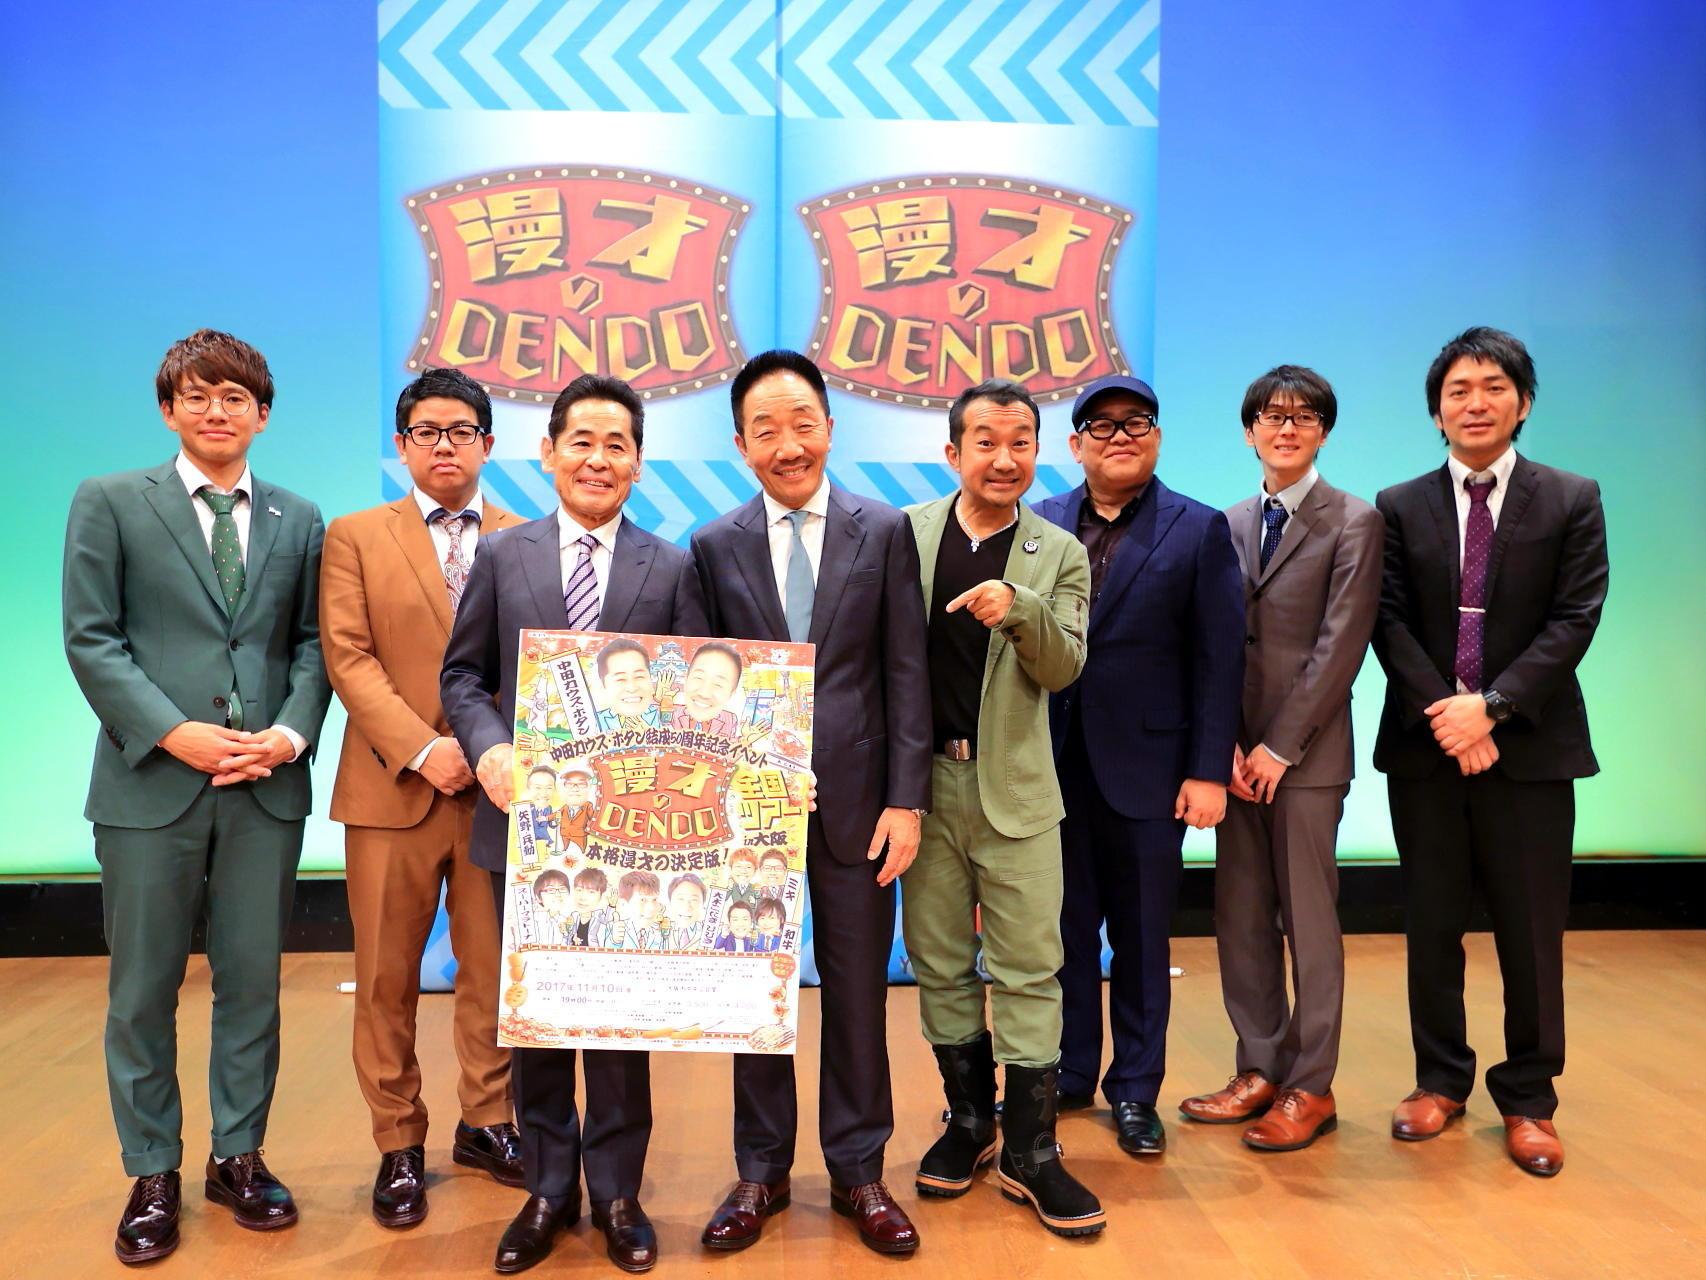 http://news.yoshimoto.co.jp/20171112095013-dfa238dd217f7ce7f8adfc1c65b8912e392bd366.jpg